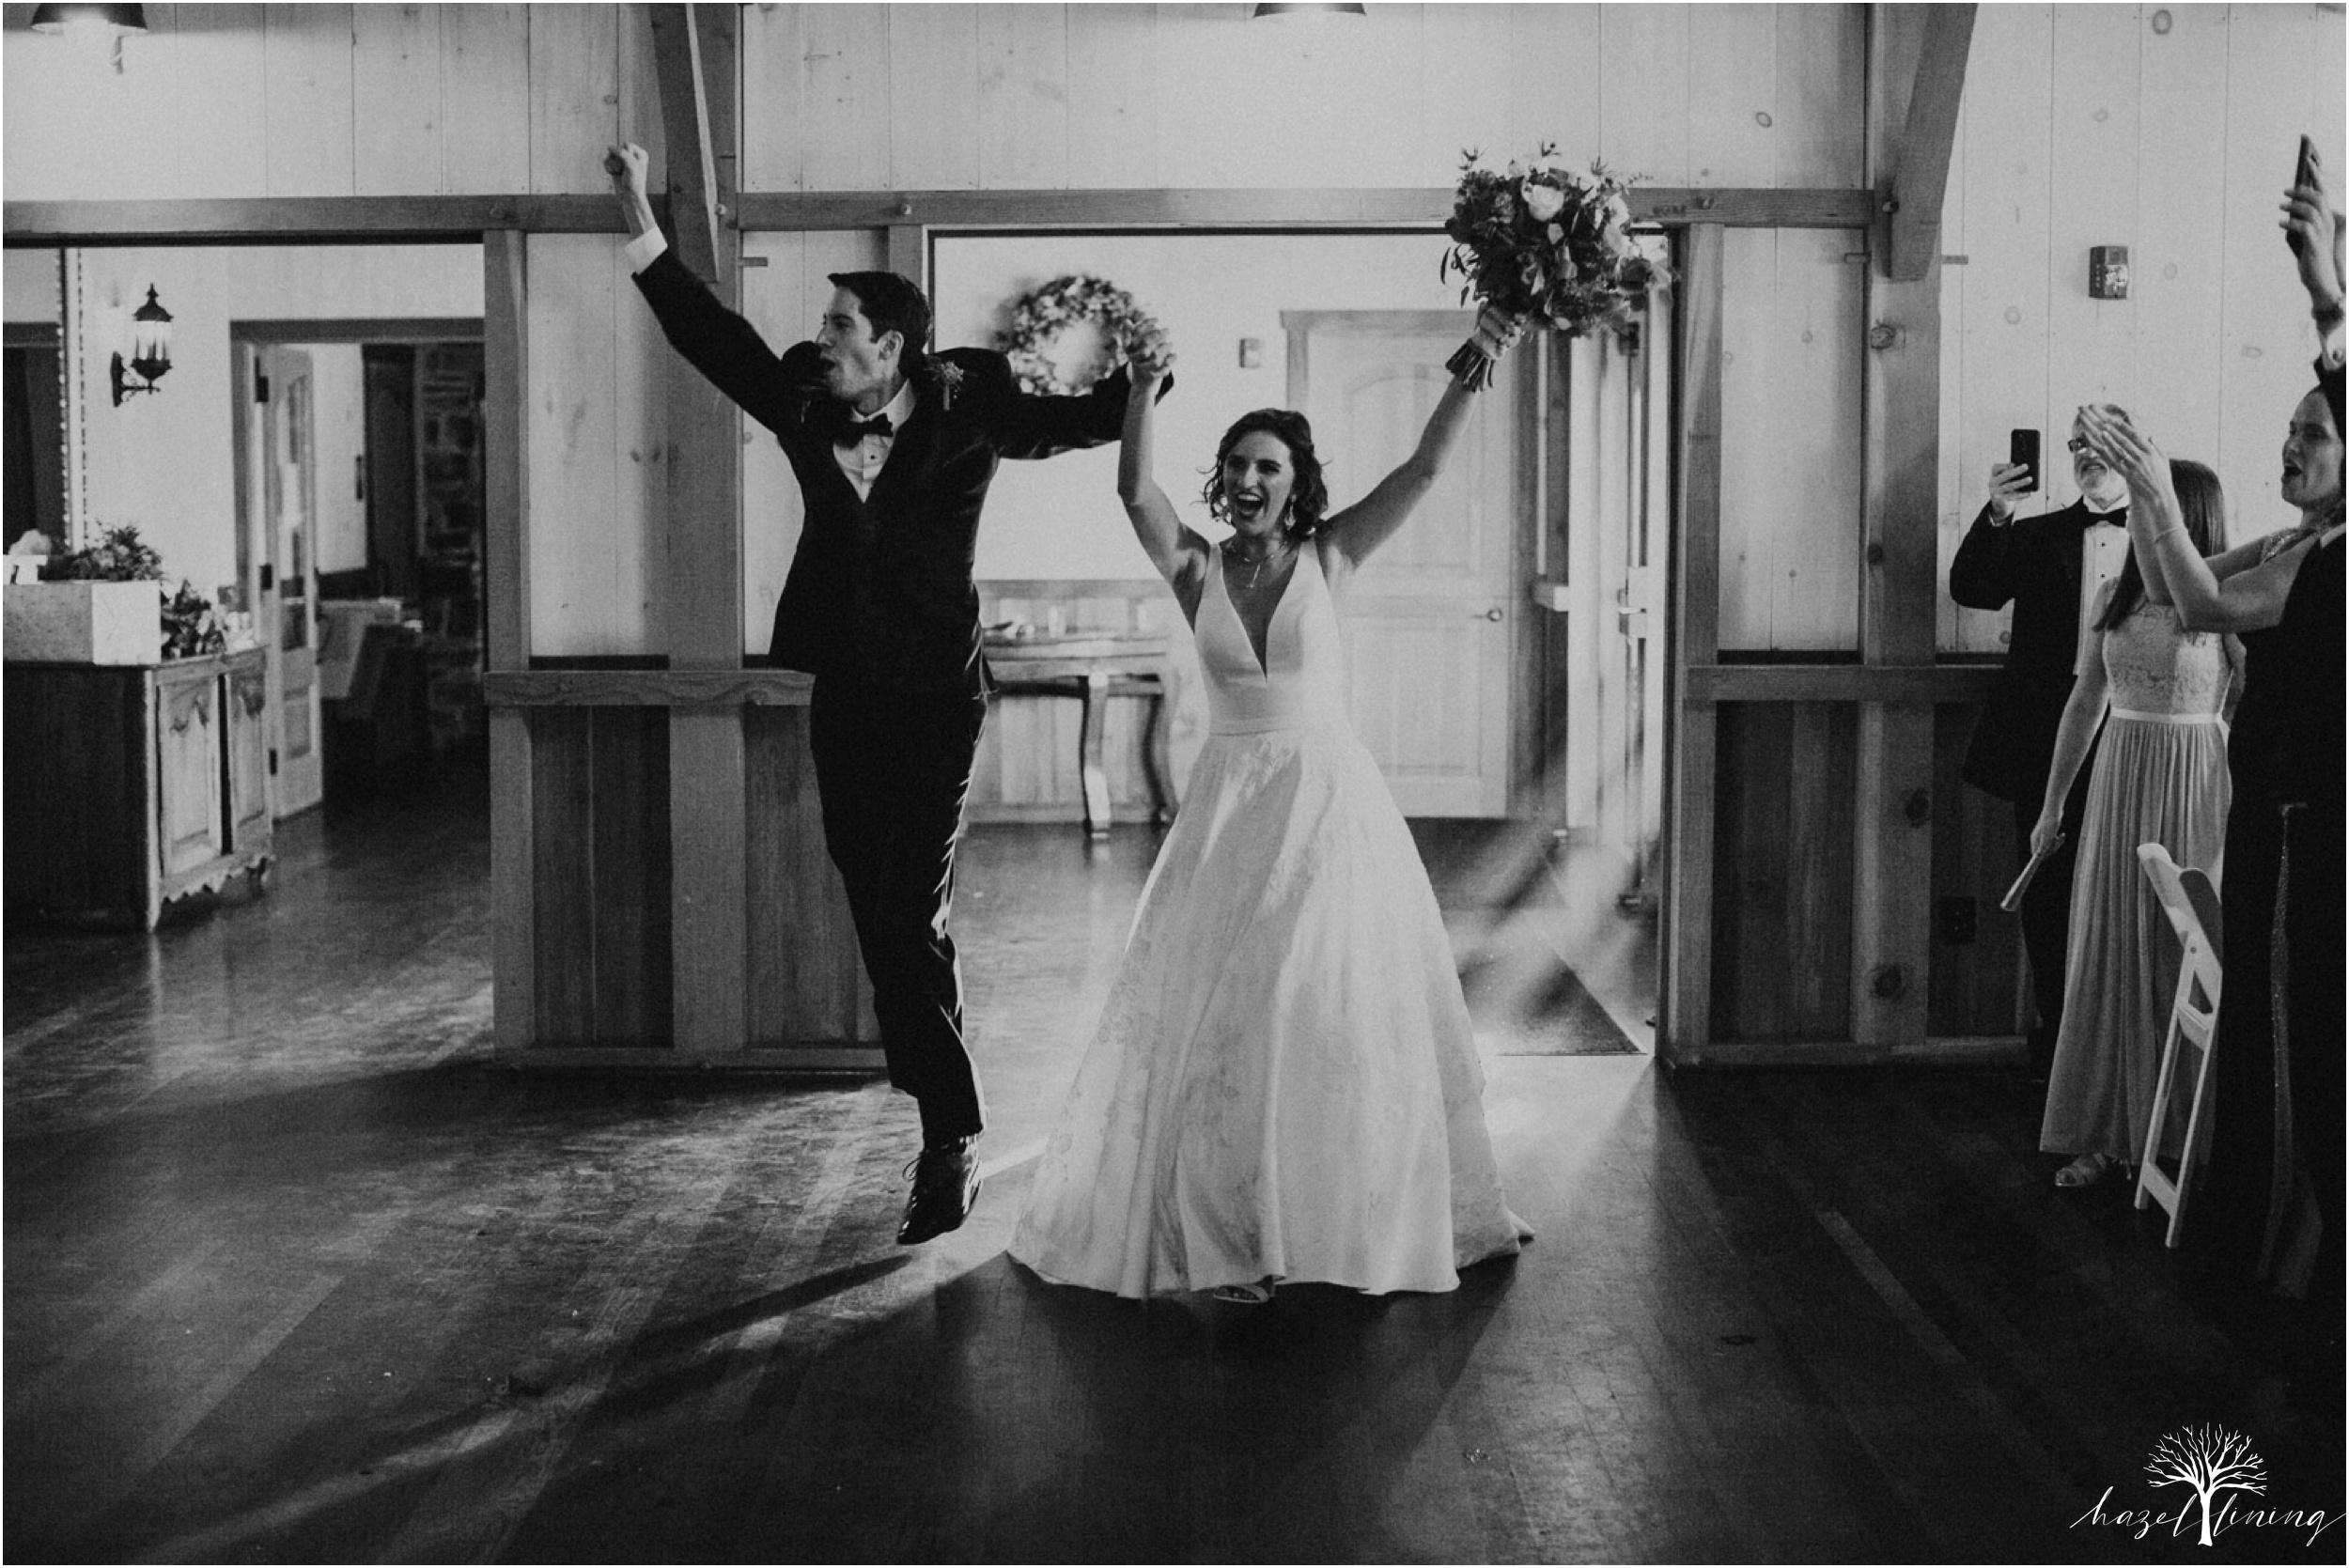 maureen-hepner-anthony-giordano-rose-bank-winery-newtow-pennsylvania-luxury-summer-wedding-hazel-lining-photography-destination-elopement-wedding-engagement-photography_0135.jpg